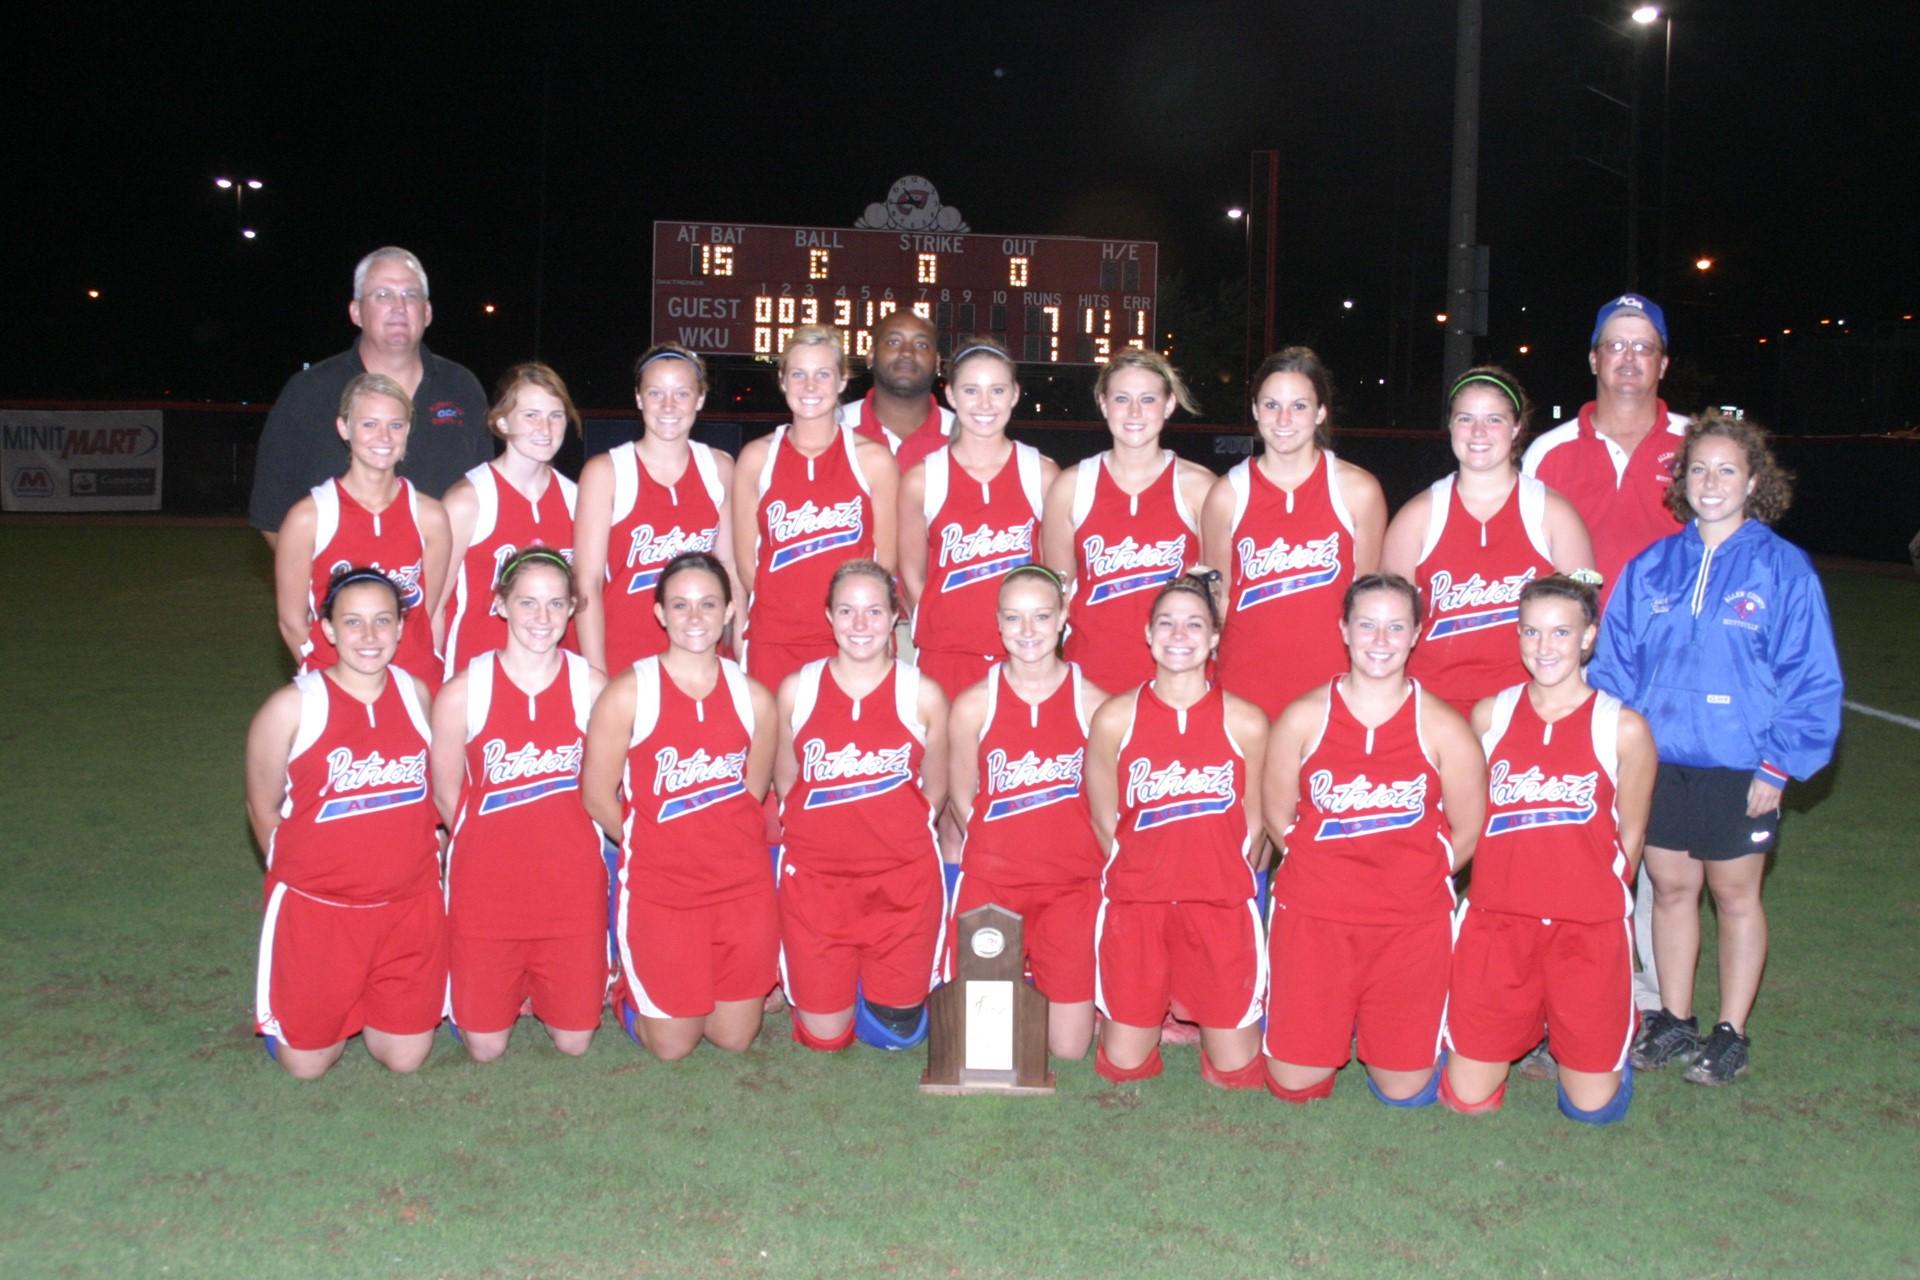 2009 Region 4 Champions